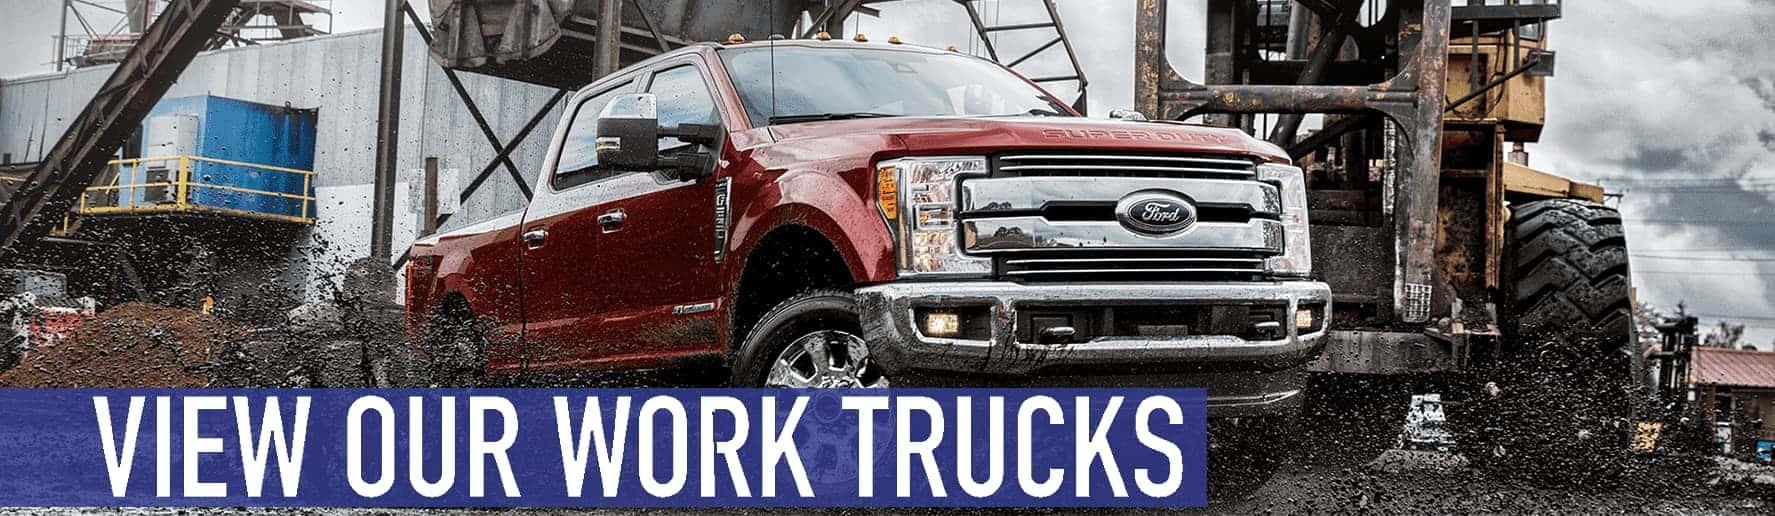 Resized Ford Veiw Our Work Trucks Min Min